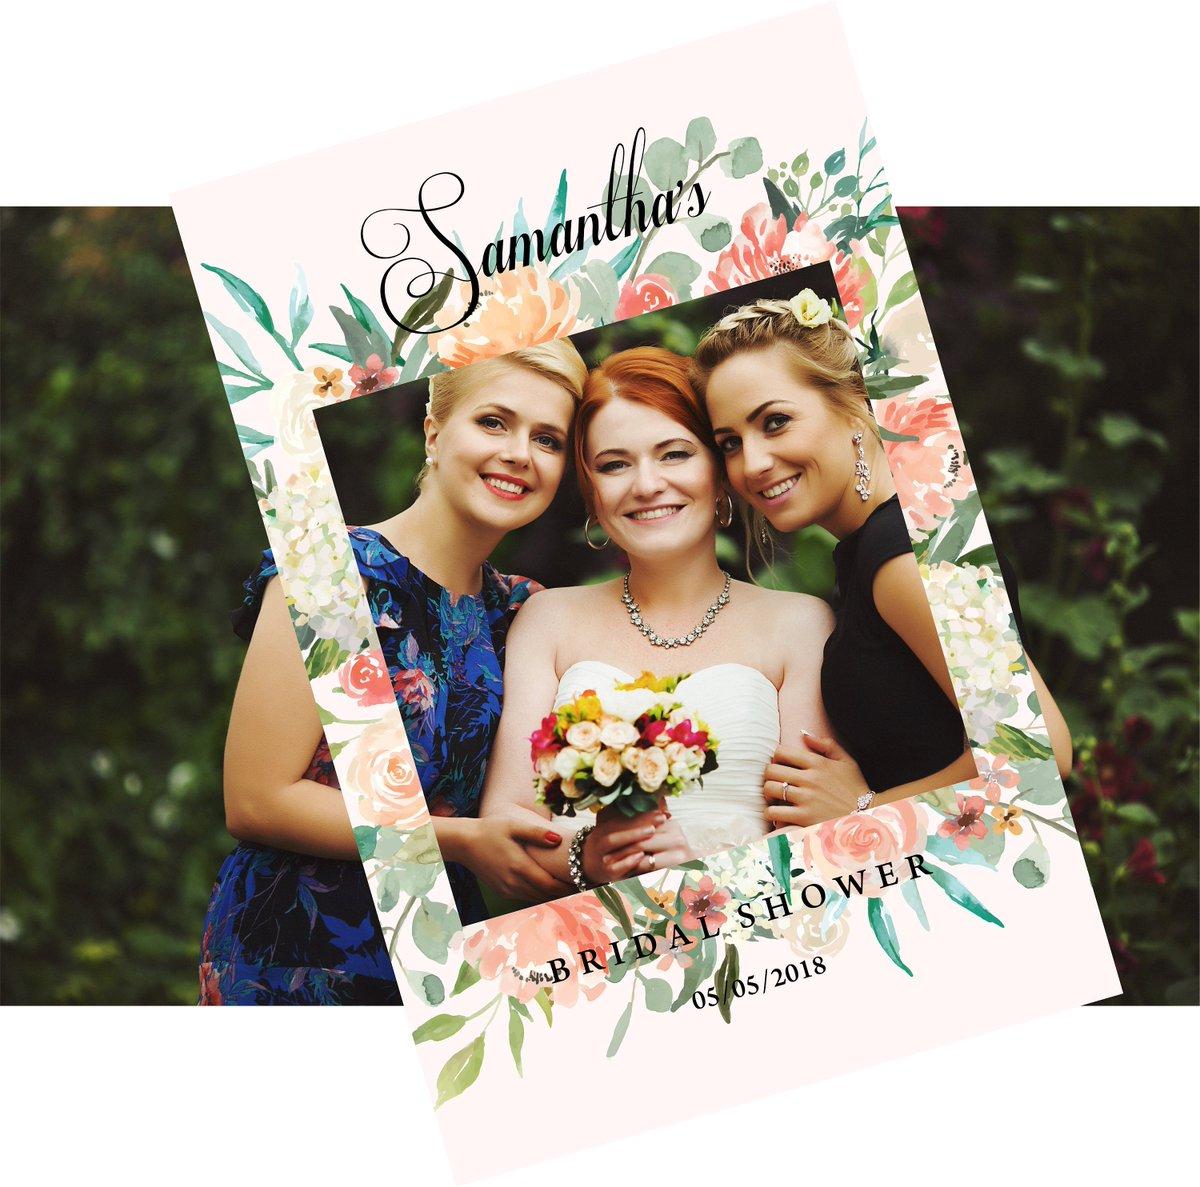 Diz On Twitter Bridal Shower Photo Prop Frame Peach Flowers On